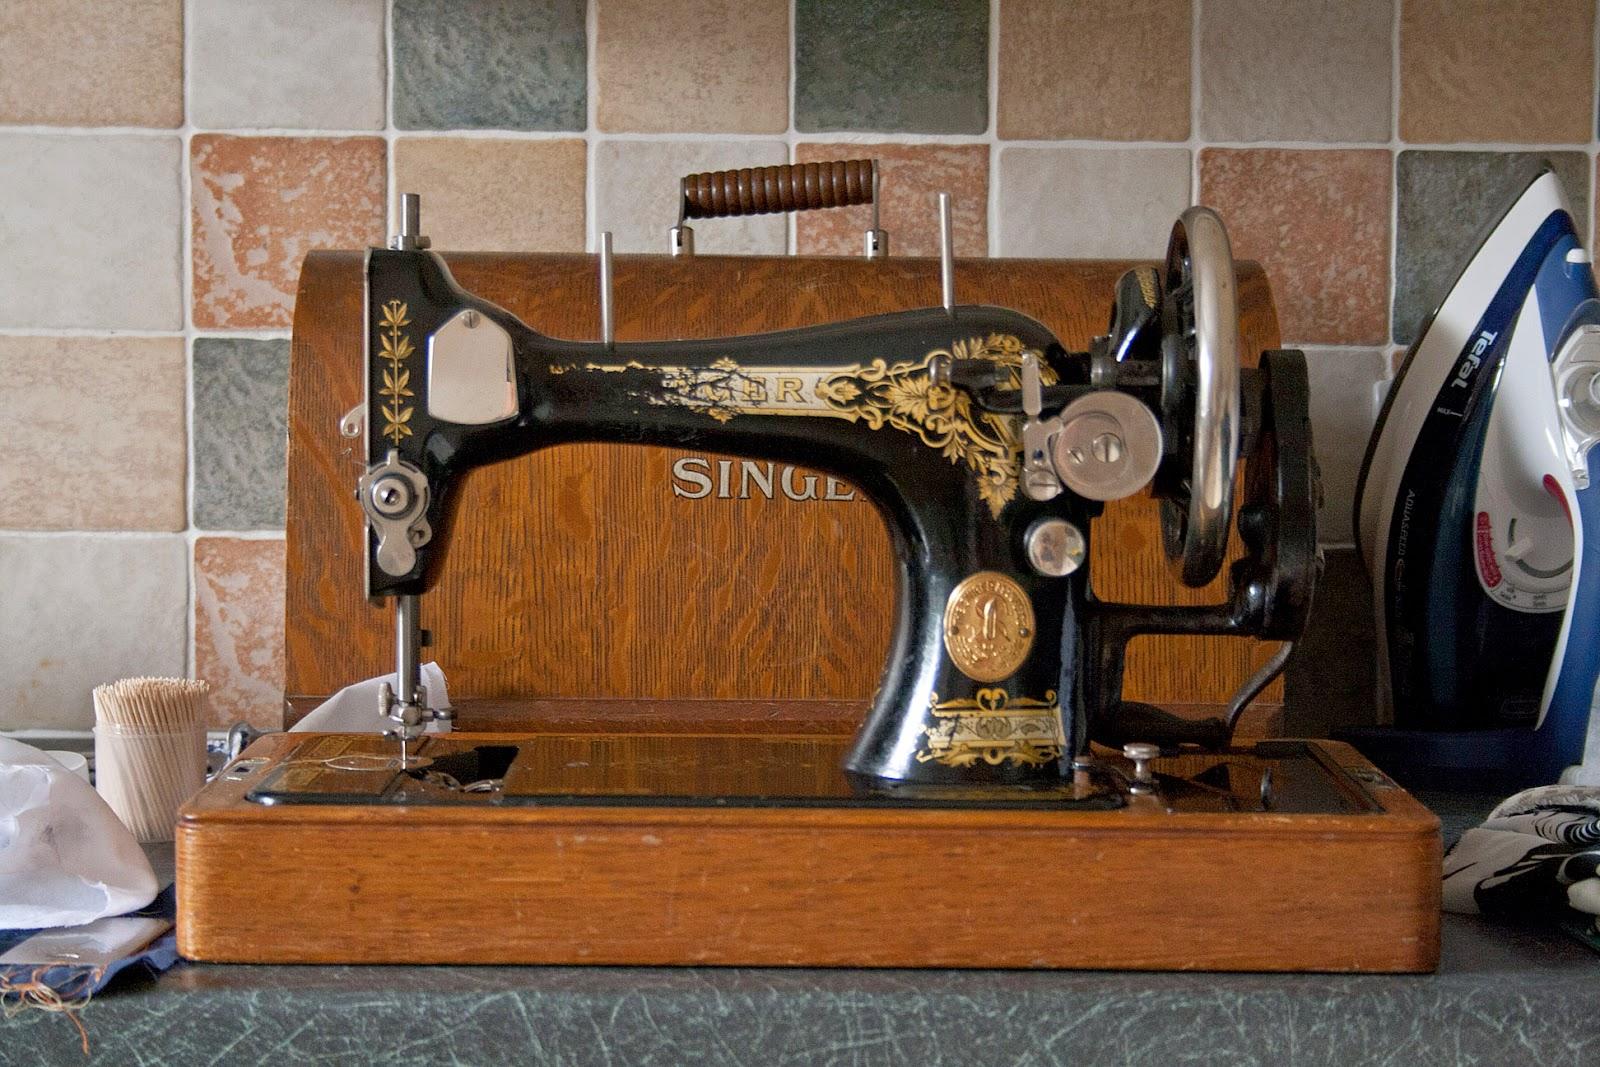 sewing machine tune up